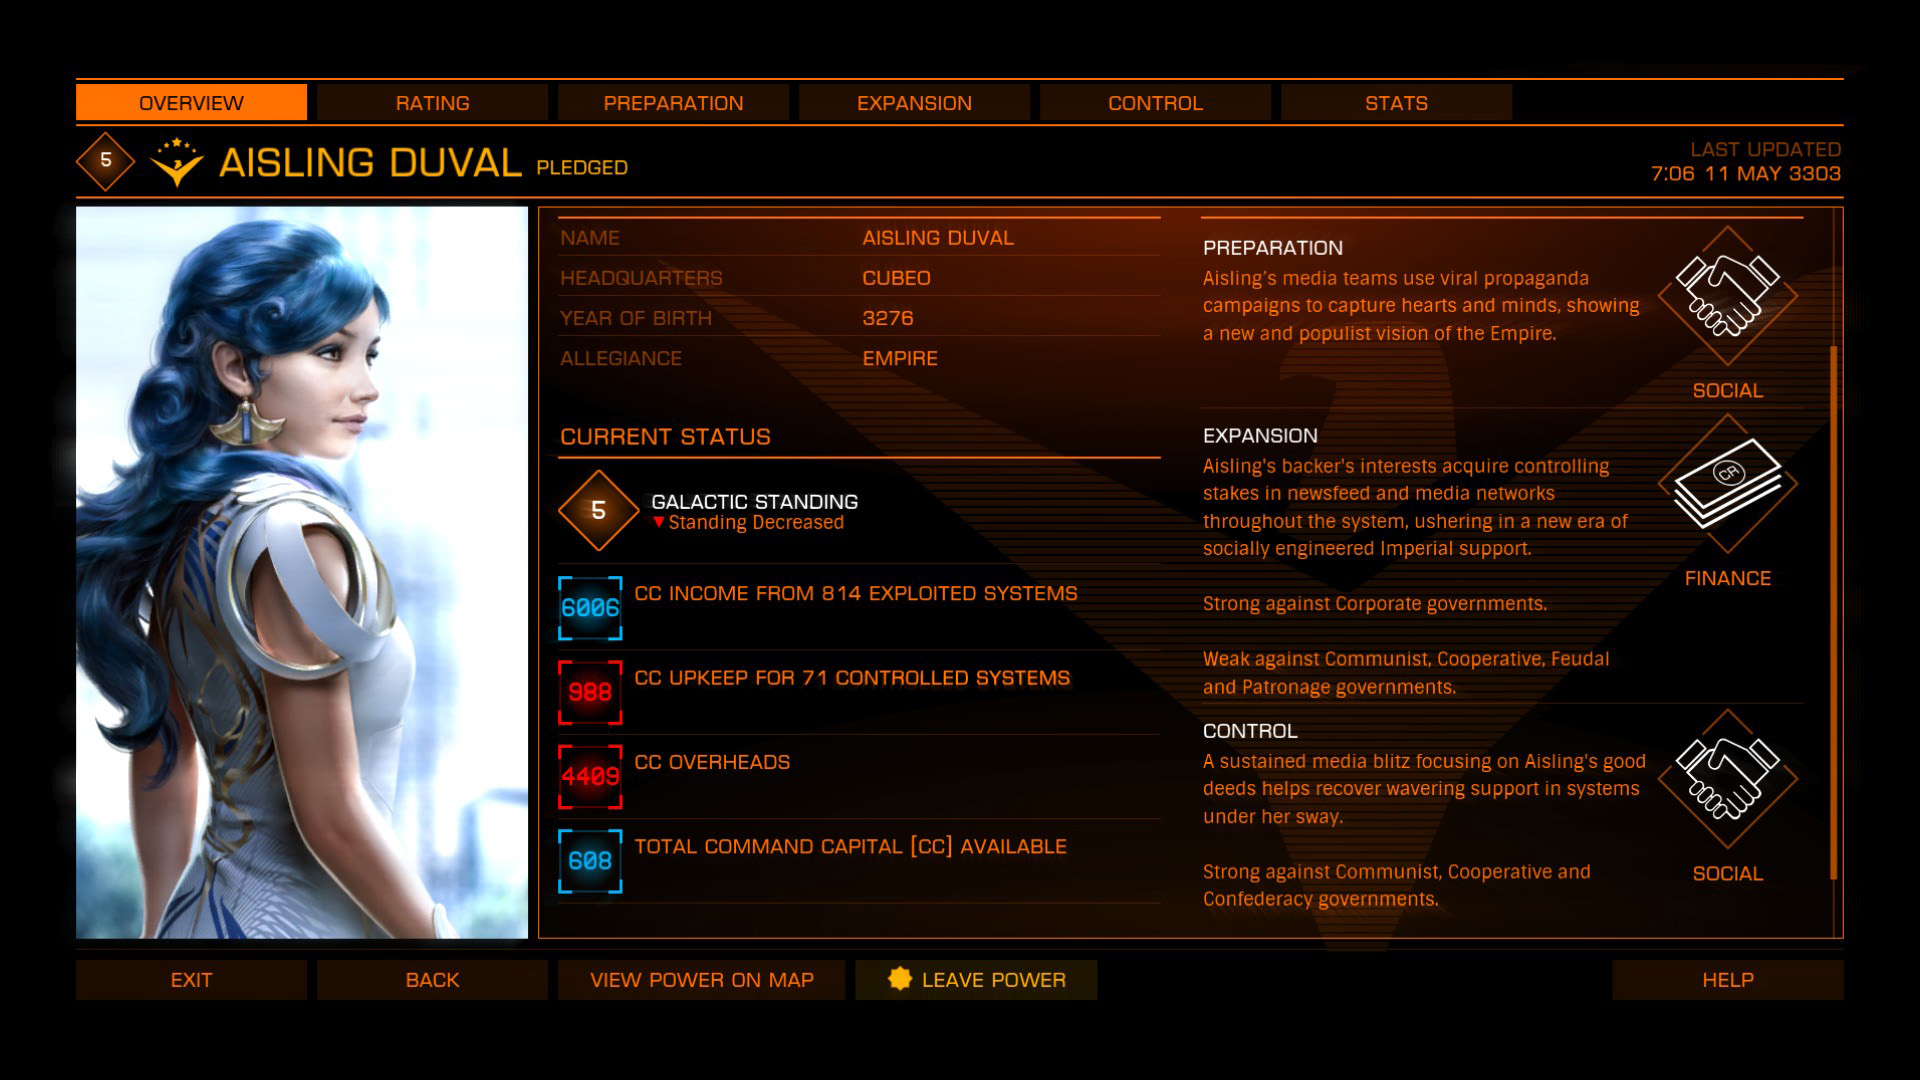 Elite: Dangerous beginner's guide: a screenshot showing command capital info for Aisling Duval